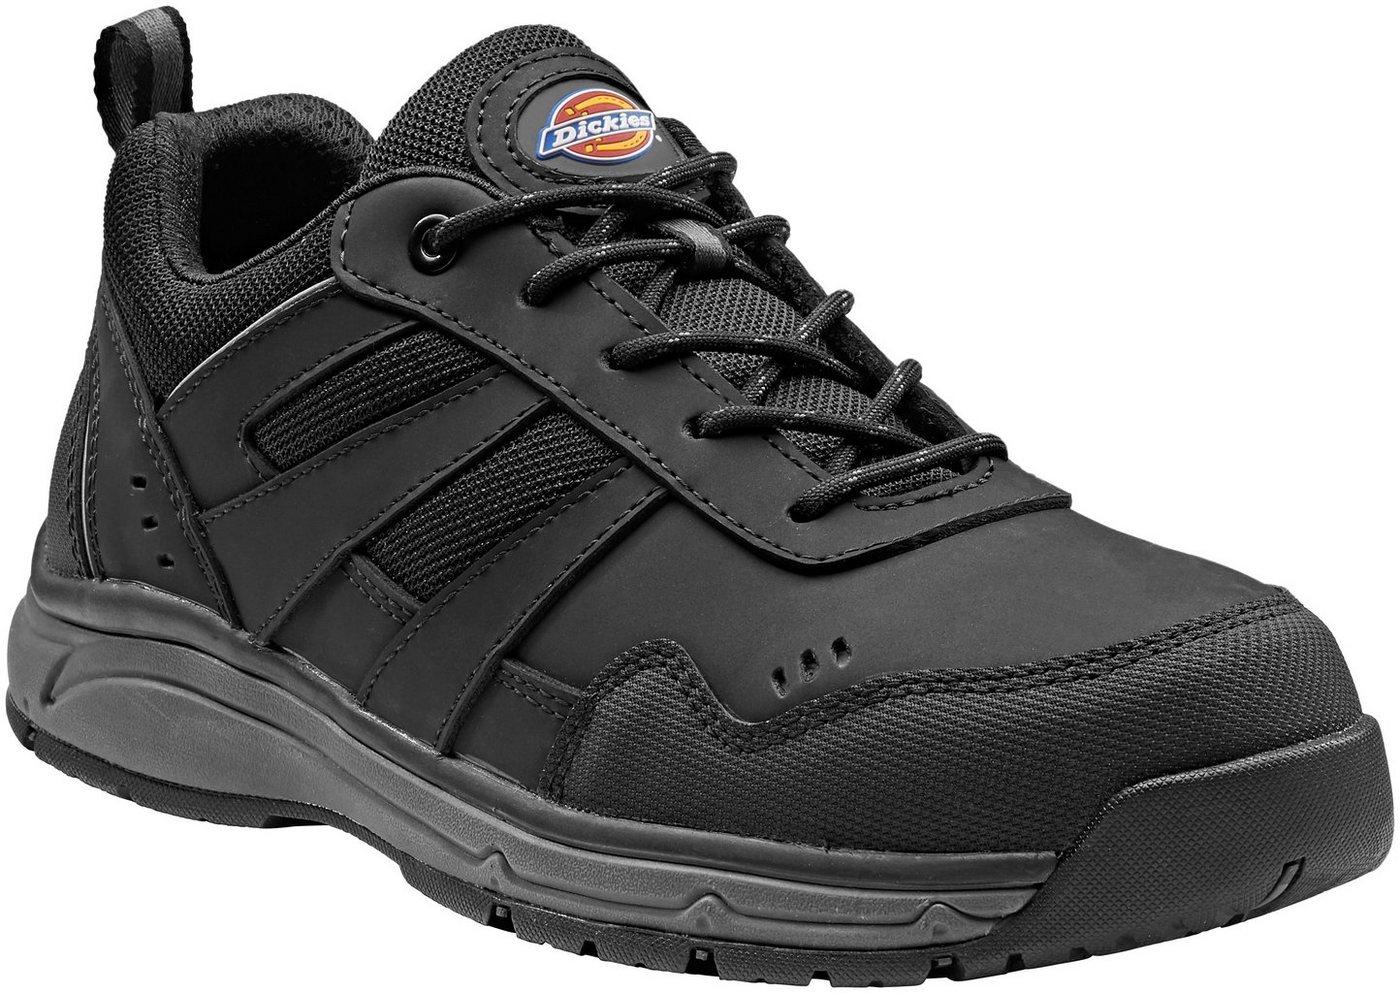 DICKIES Sicherheitsschuh »Emerson S3« | Schuhe > Sicherheitsschuhe | Schwarz | Dickies